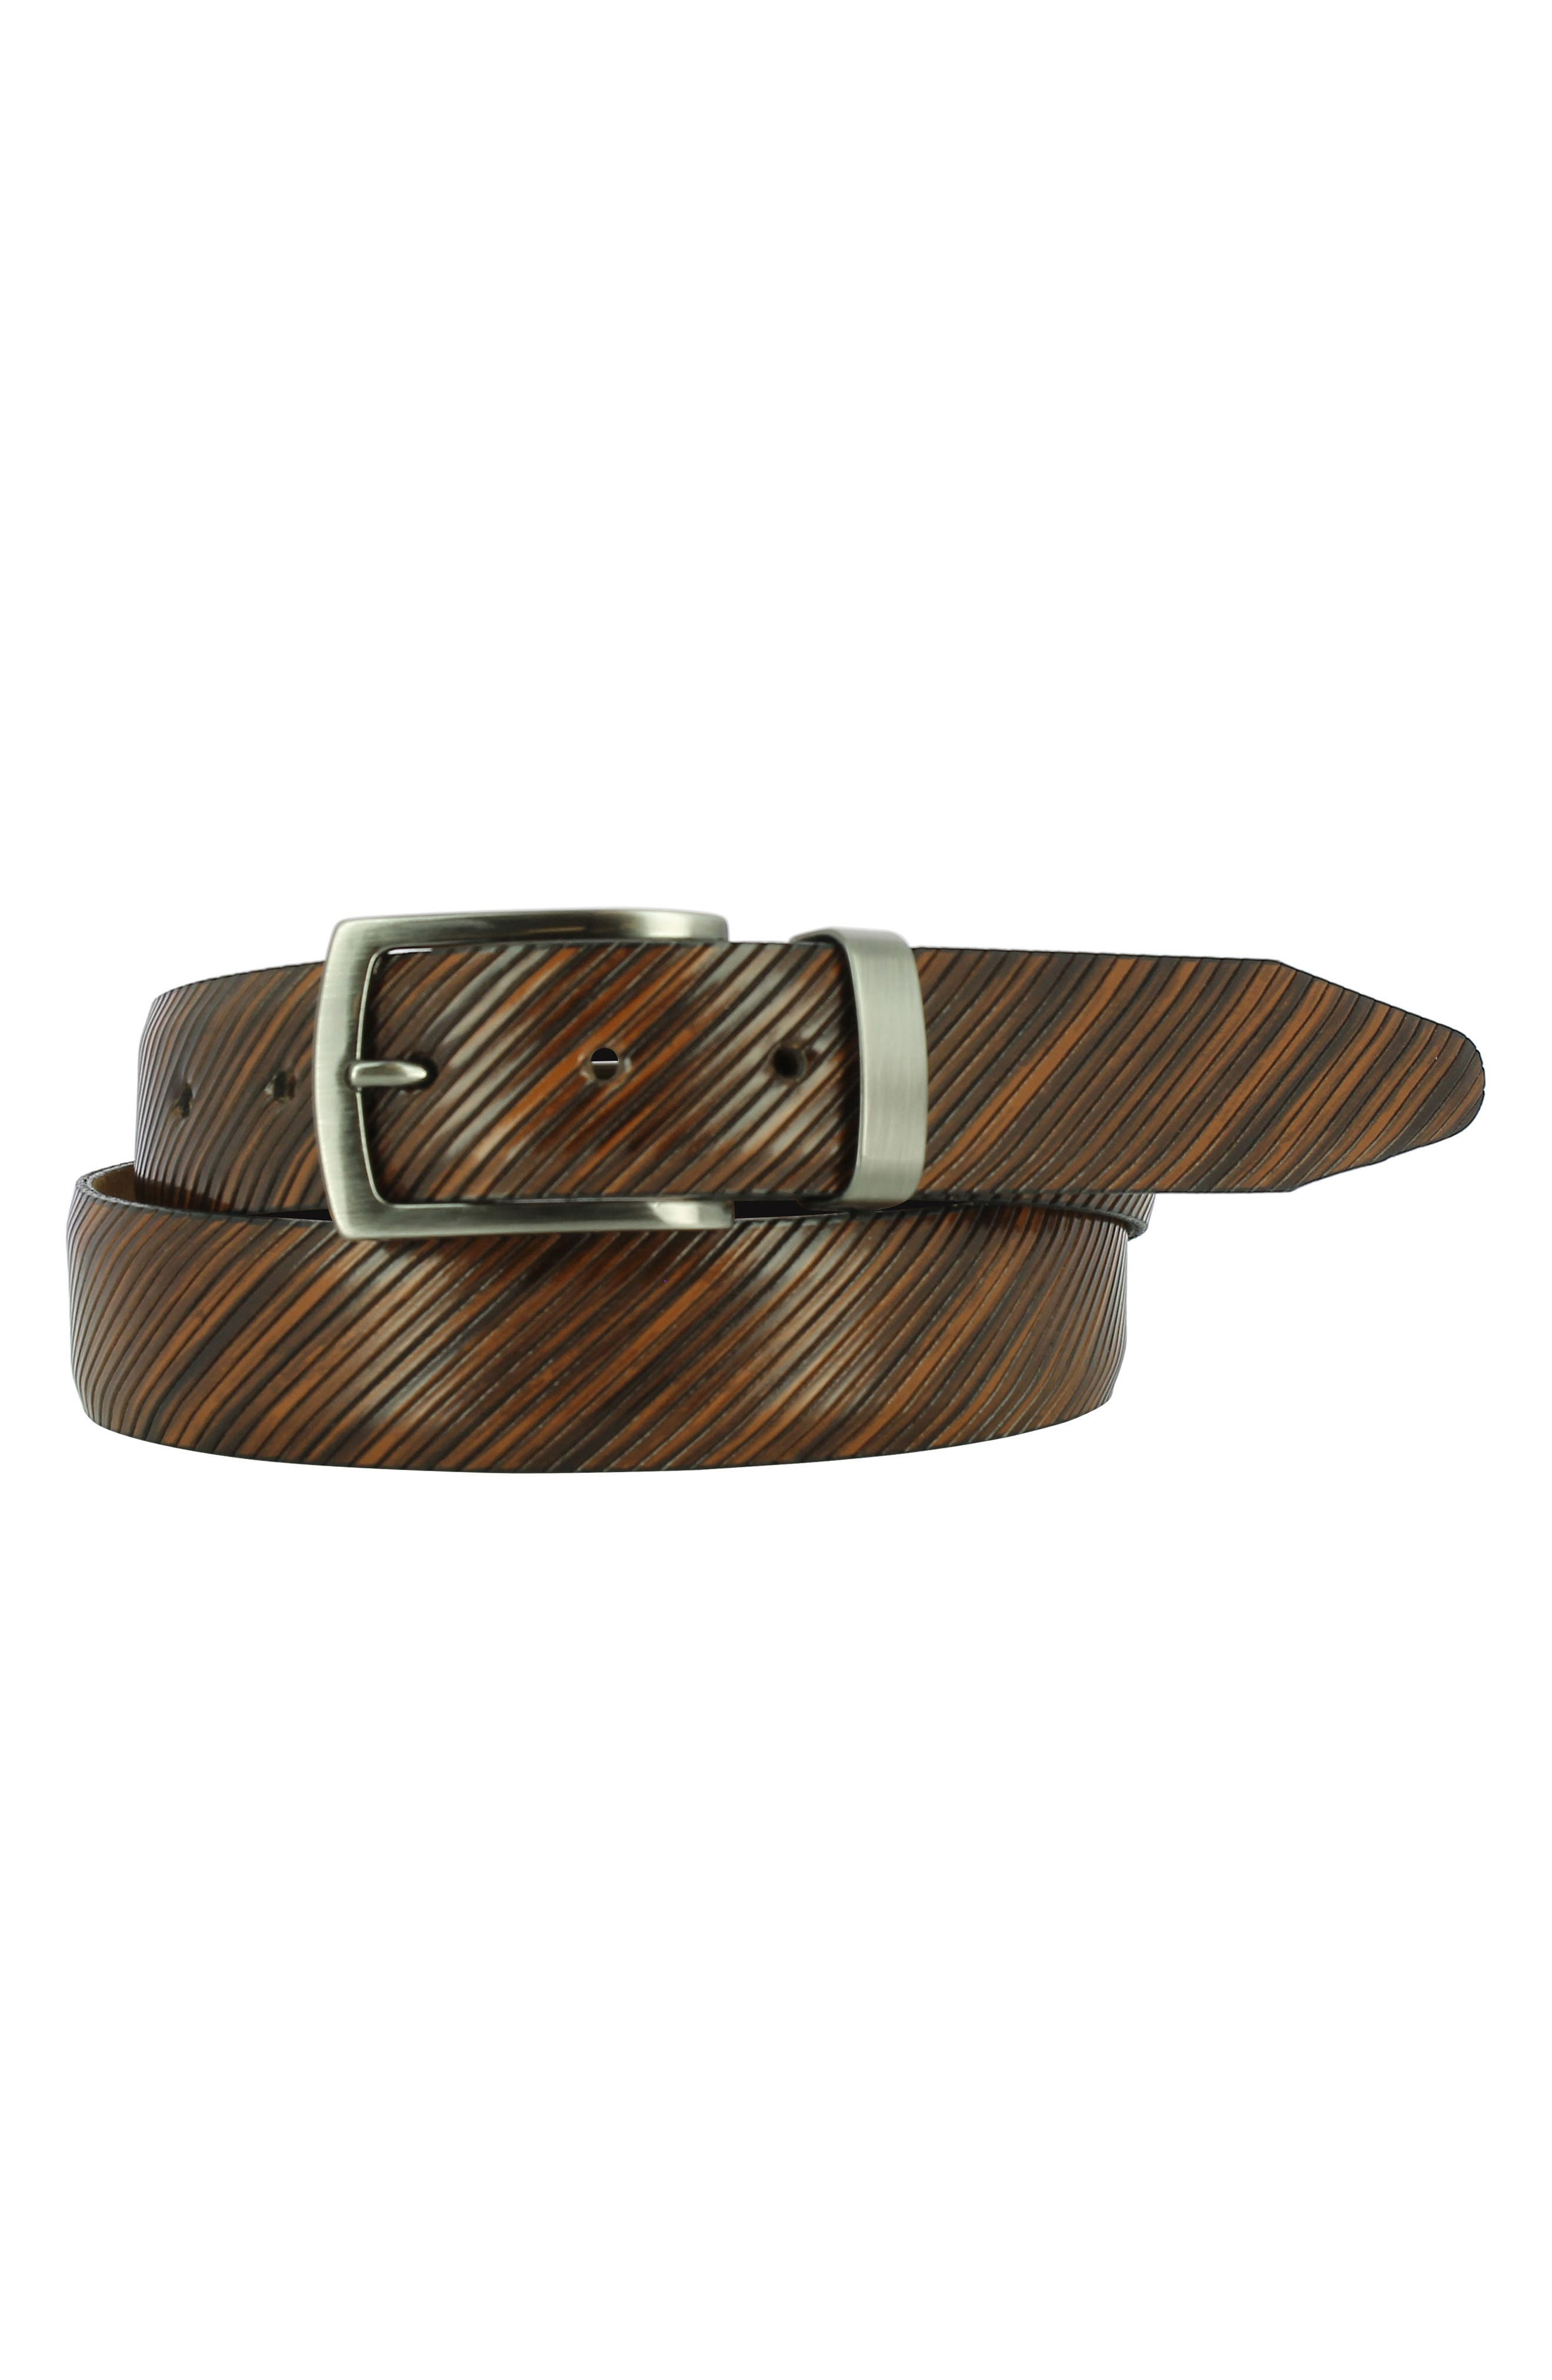 Remo Tulliani Sylvio Leather Belt